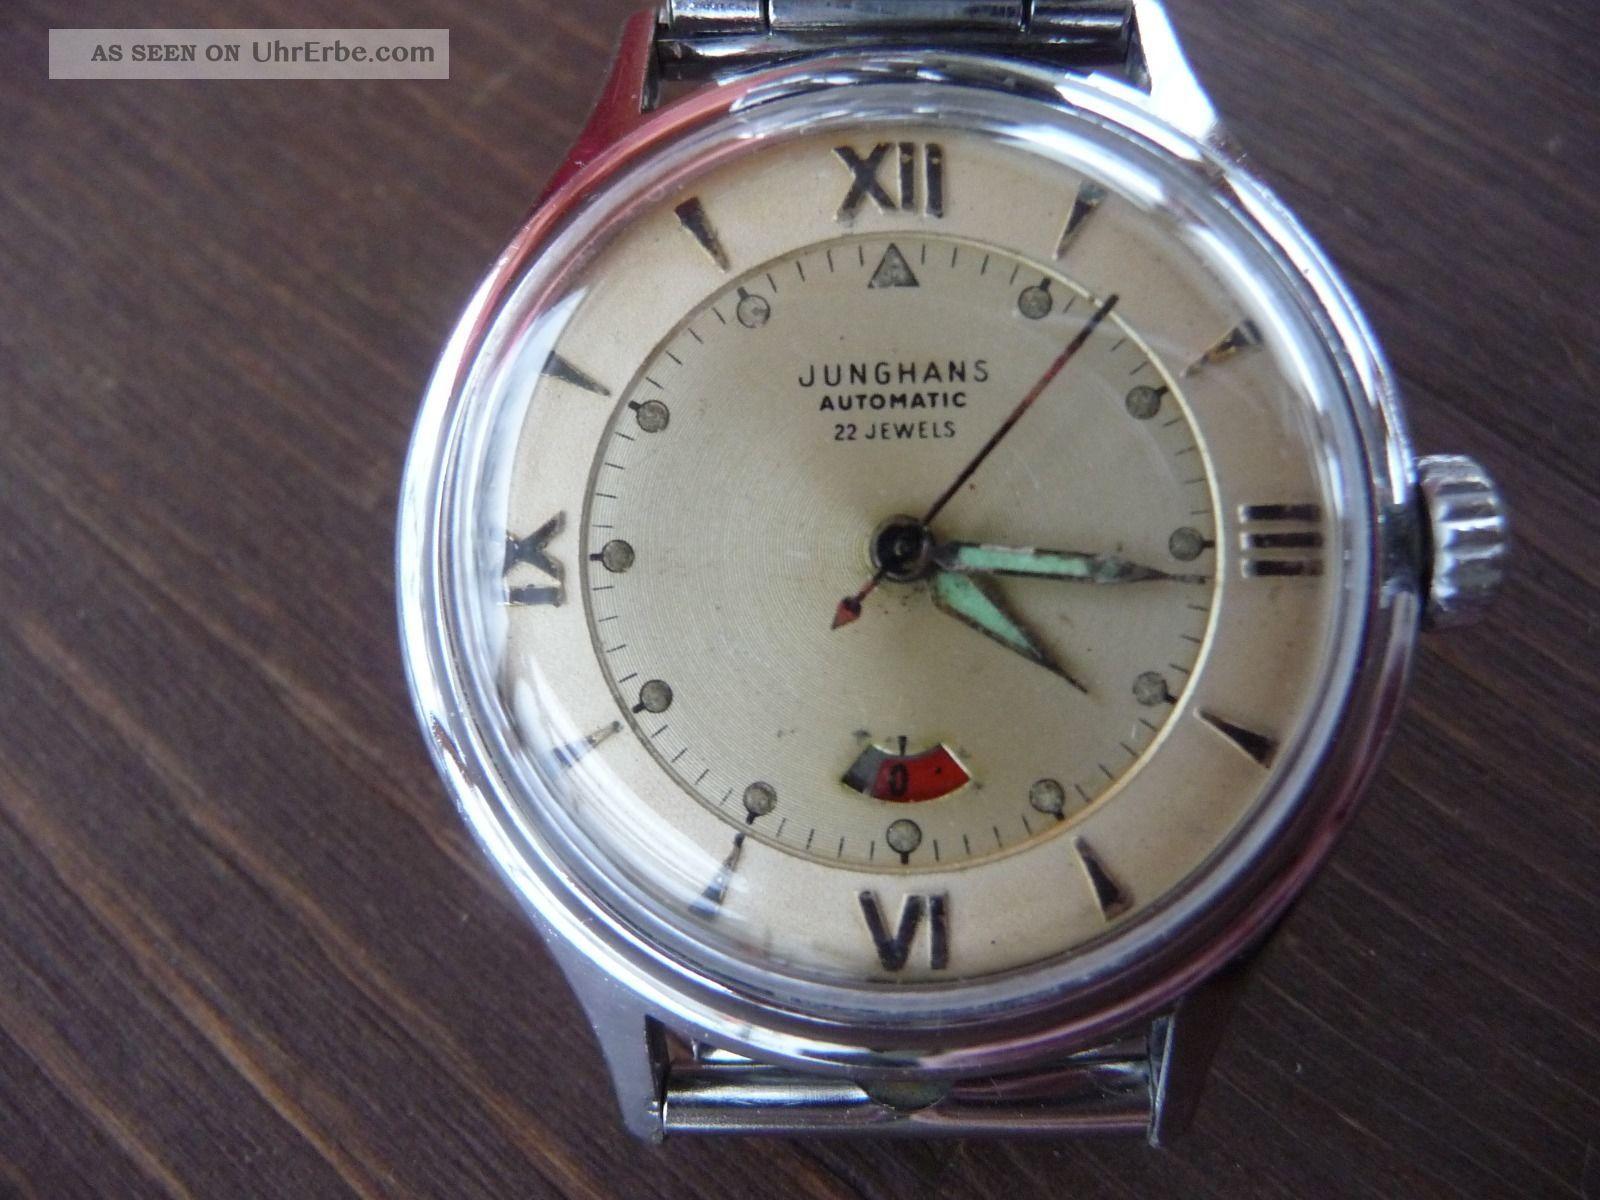 Junghans Armbanduhr Herren Alt 1951 Antik Automatikuhr Vintage In Orig Schachtel Armbanduhren Bild